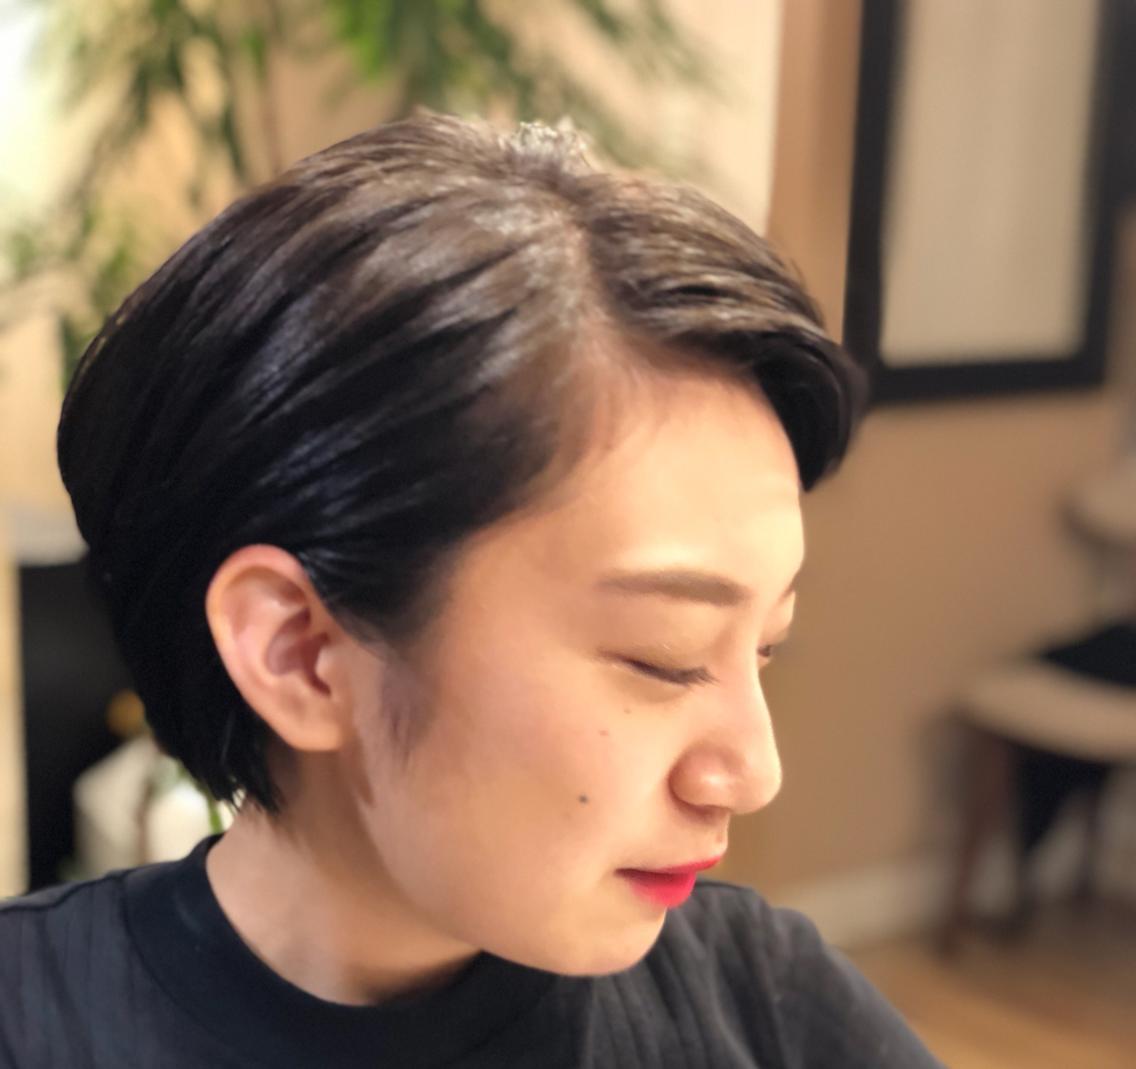 AMARE(アマーレ)所属・笠井 翔太の掲載